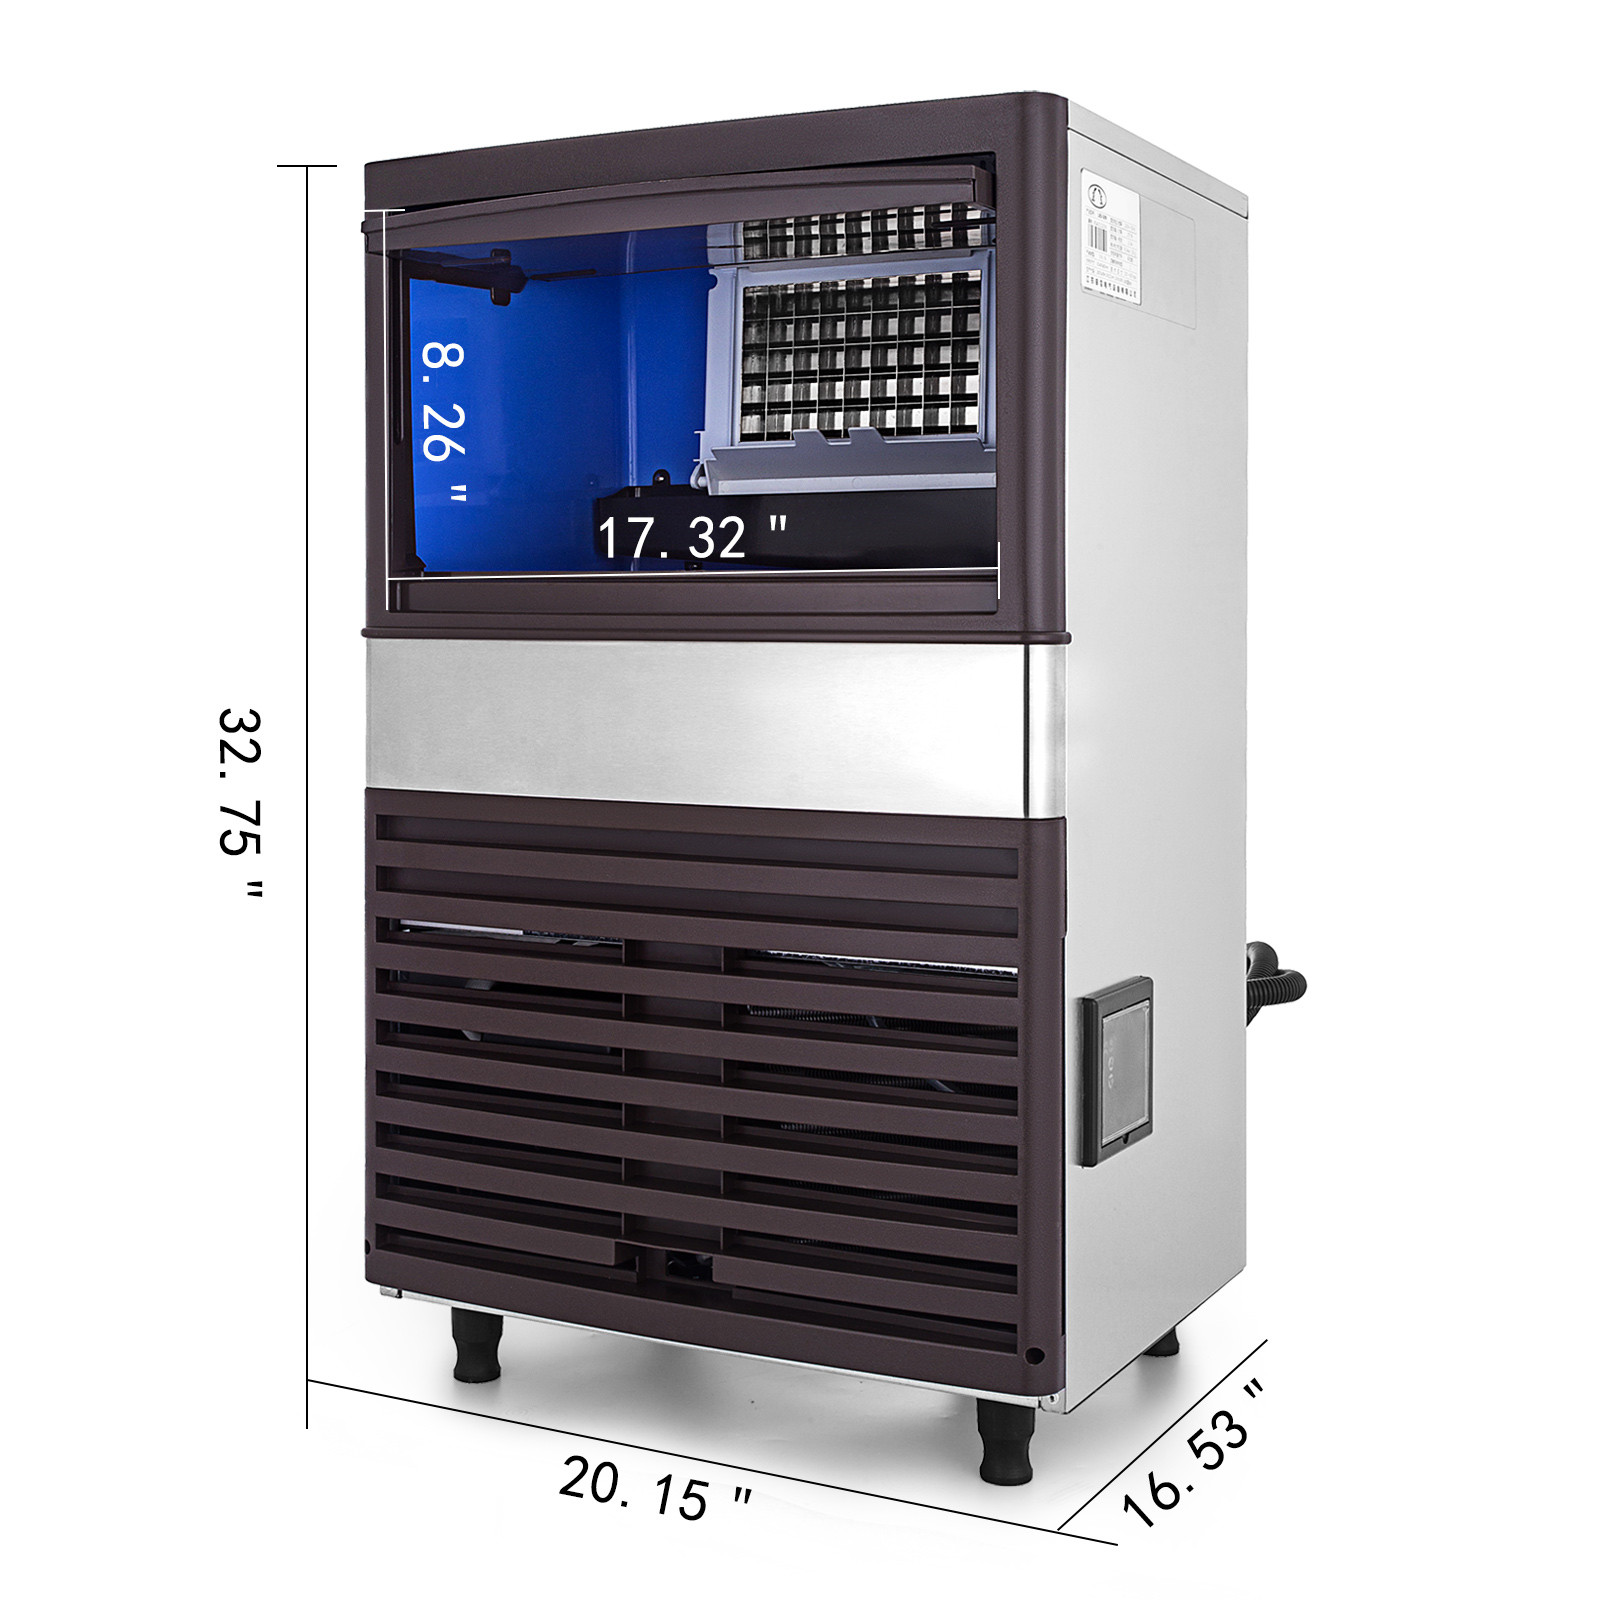 40-55-KG-Intelligent-Ice-Cube-Making-Machine-Bars-Heat-Insulation-Ice-Spoon thumbnail 26